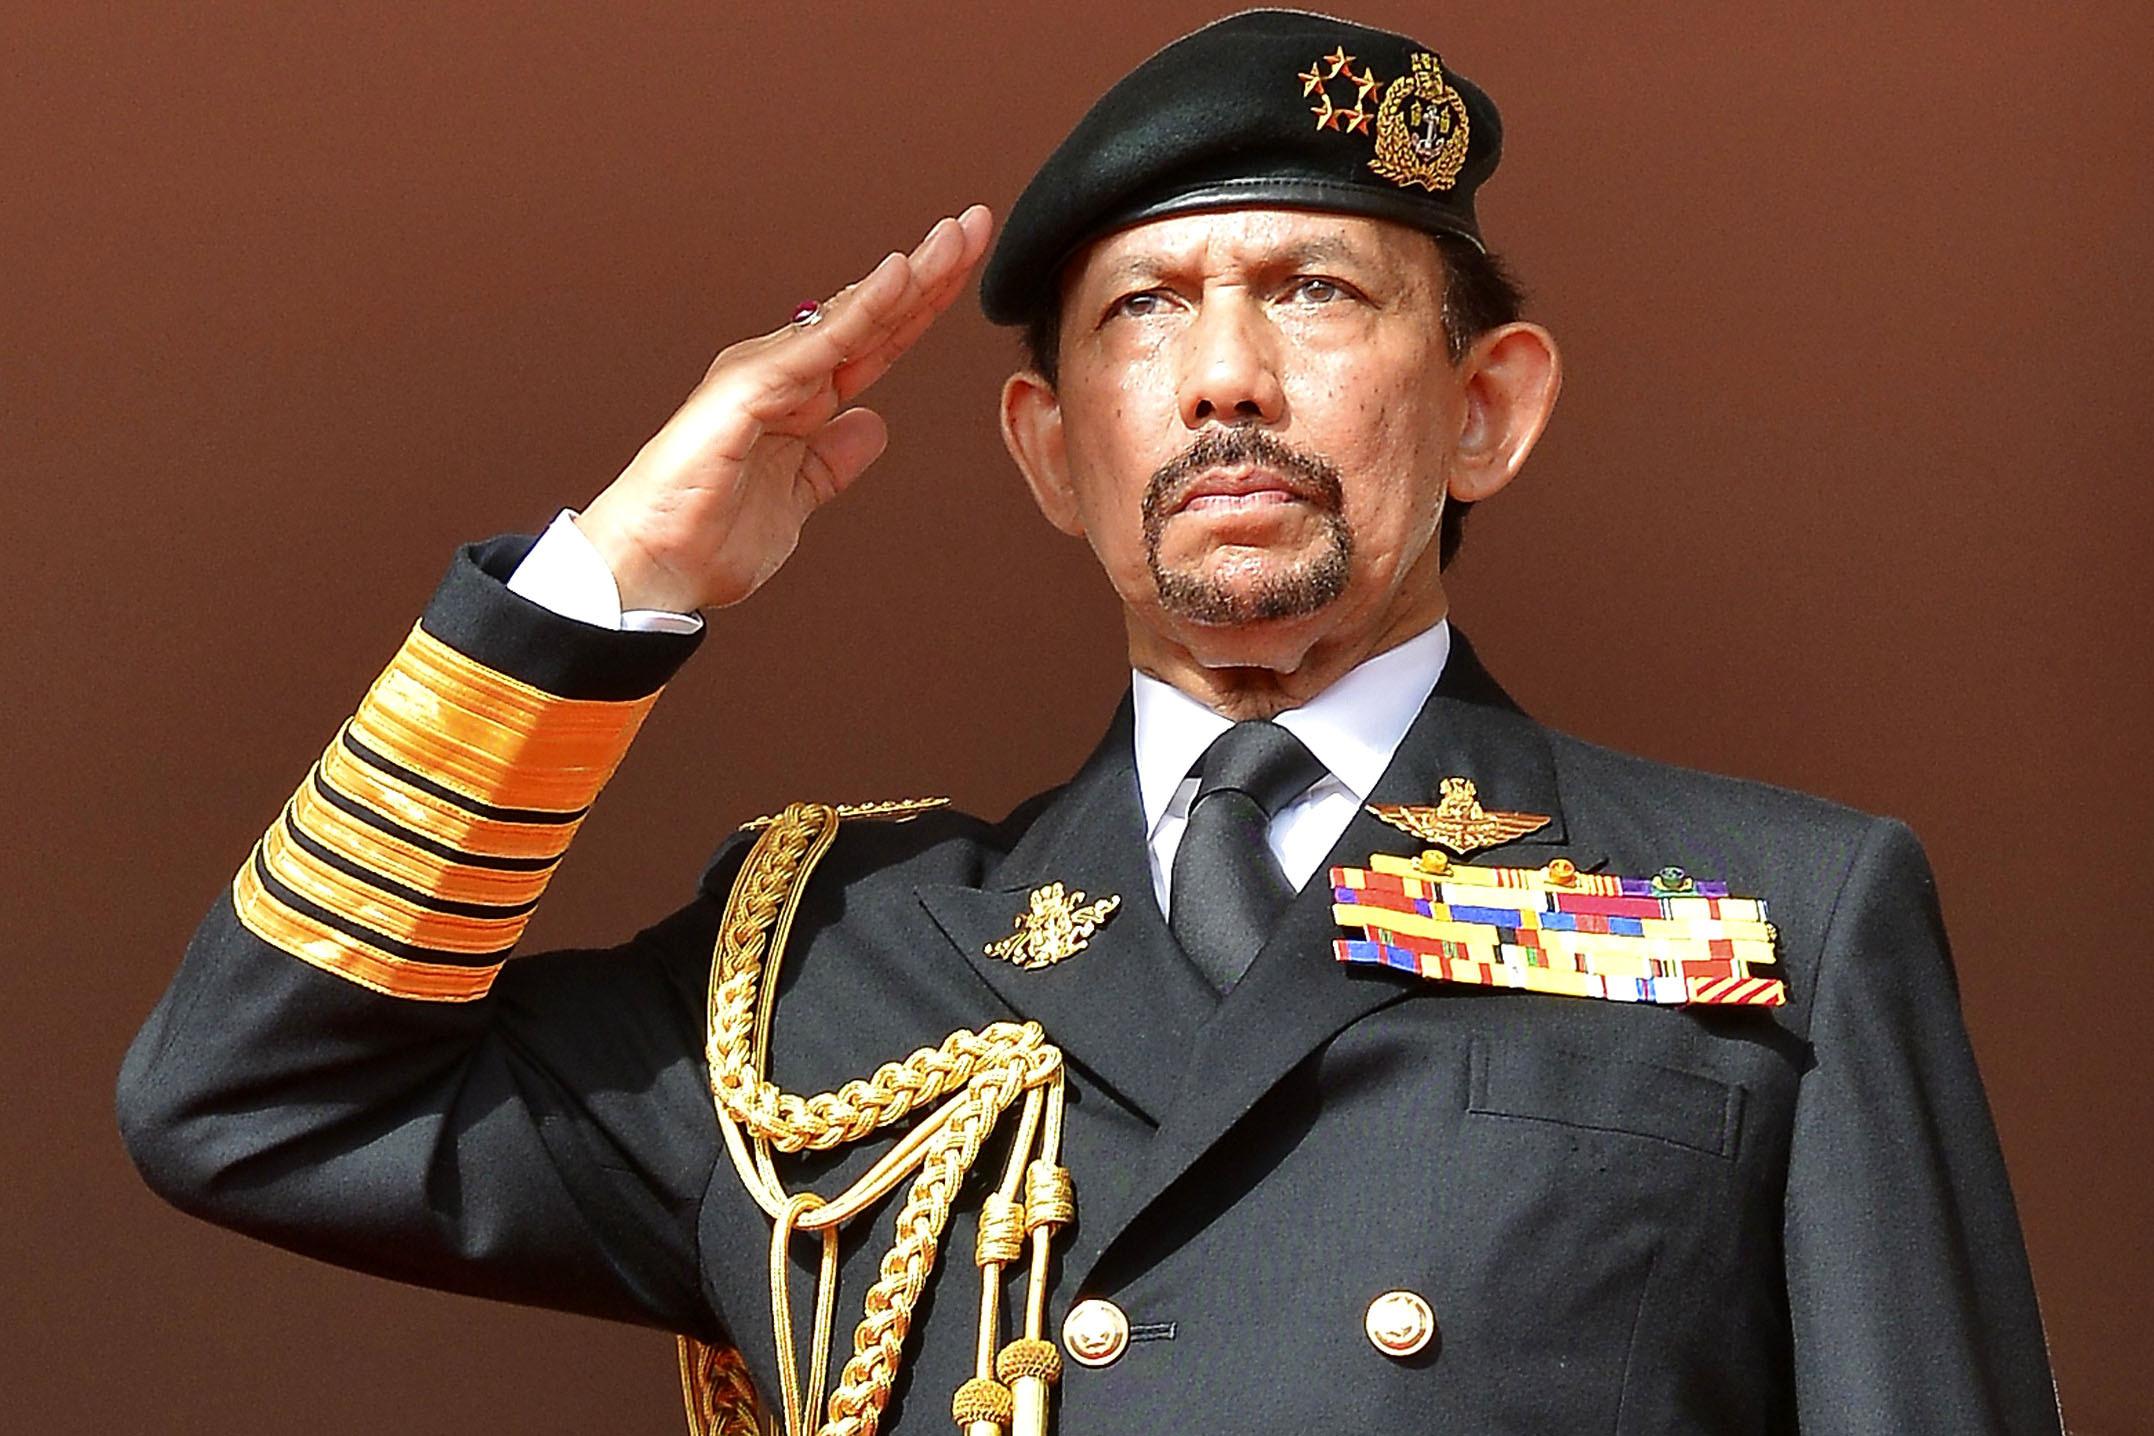 Hassanal Bolkiah, Sultan of Brunei